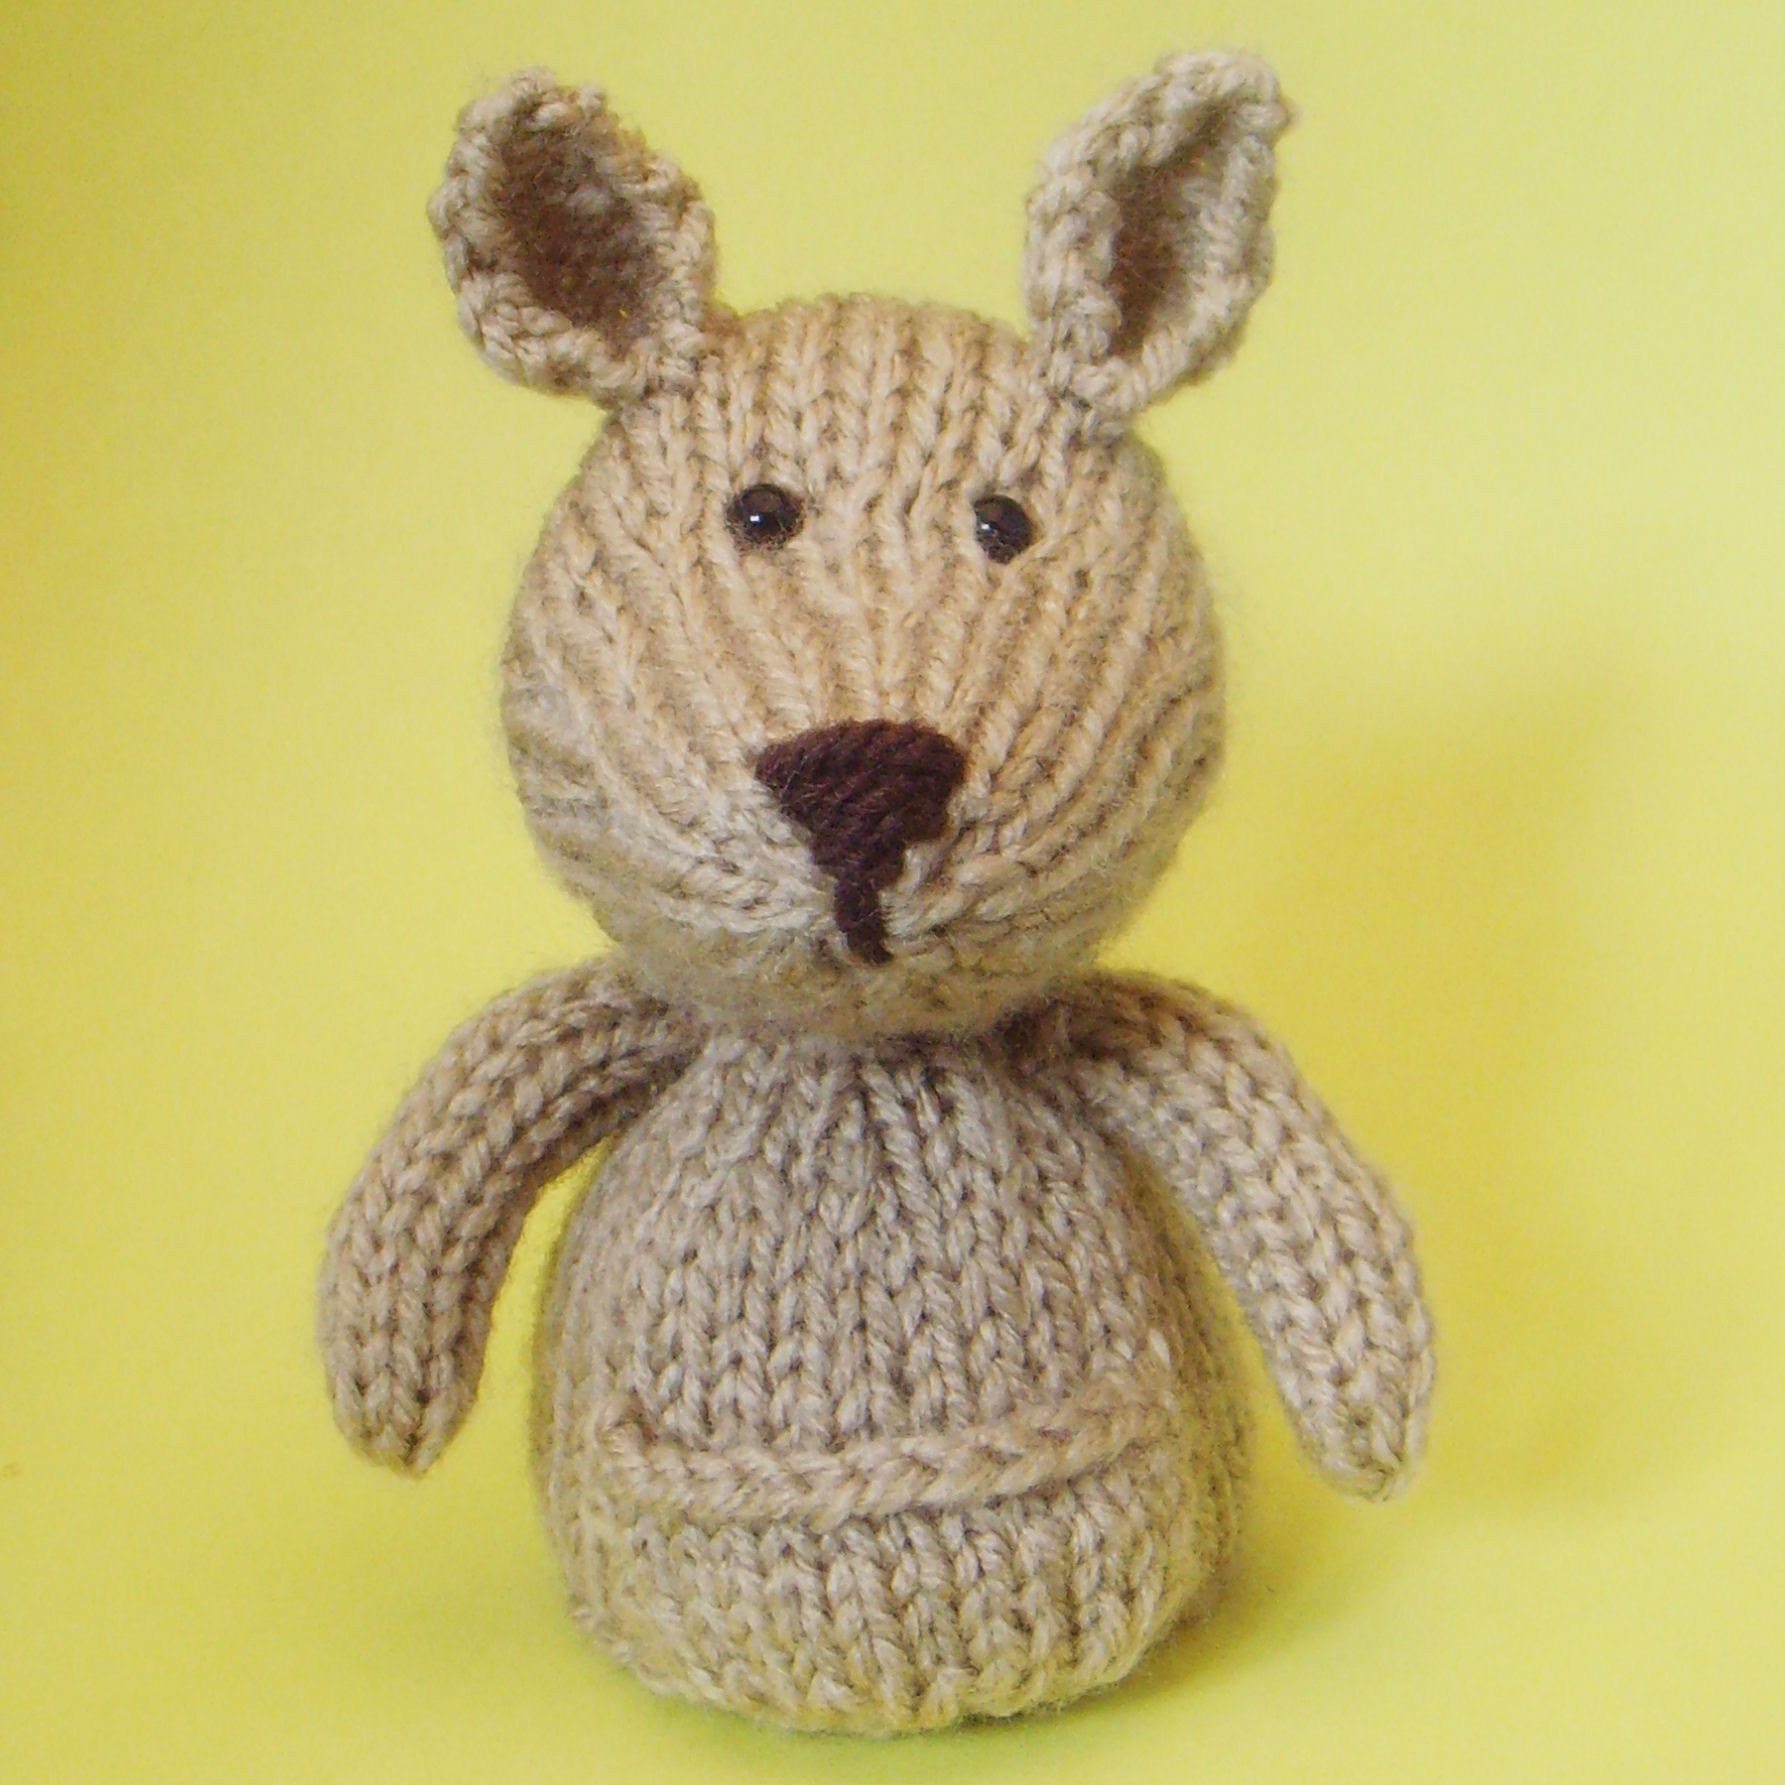 Knitting Patterns For Toys On Etsy : Kangaroo Toy Knitting Pattern PDF by Jellybum on Etsy